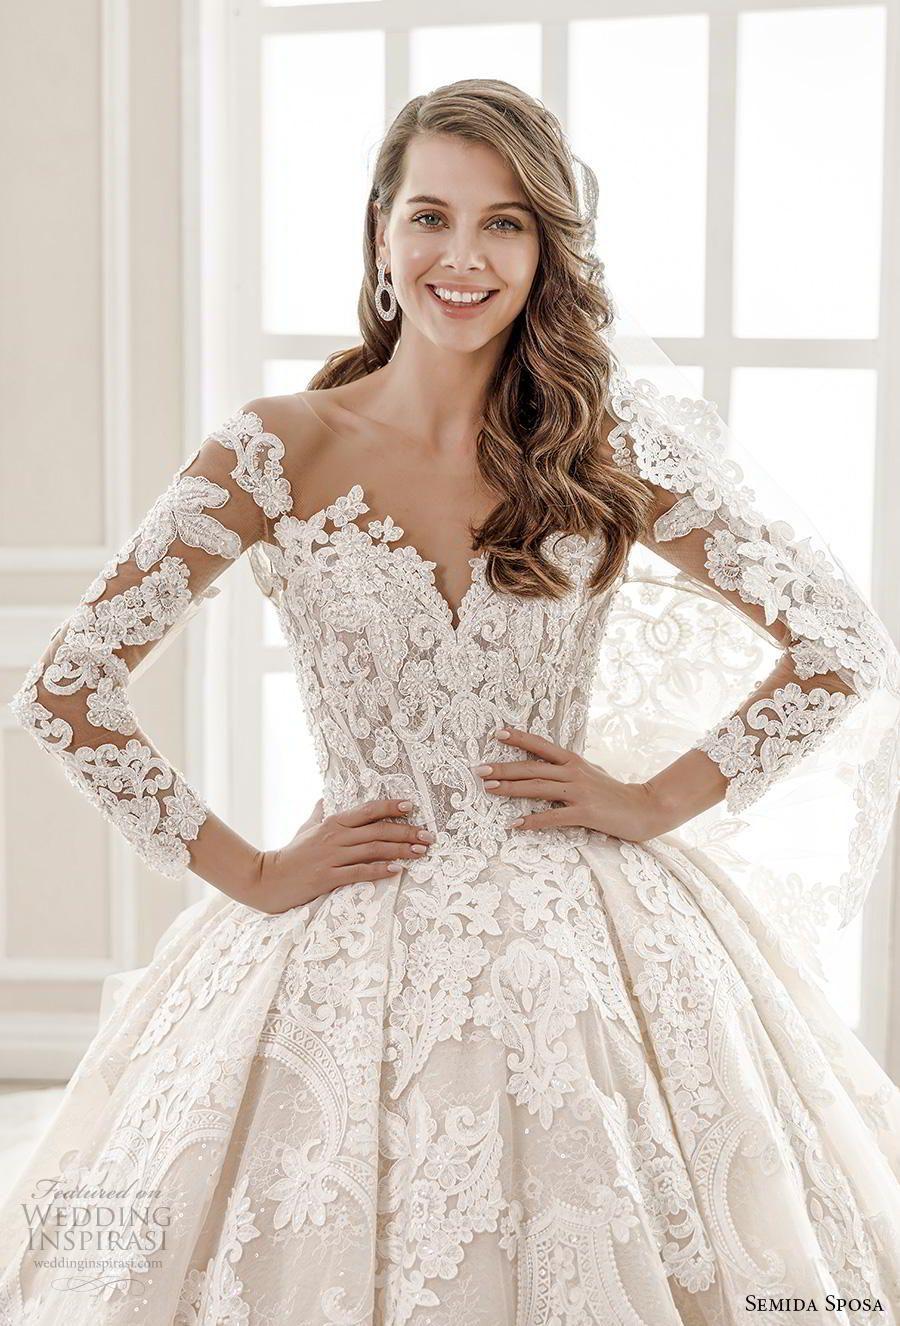 Semida Sposa 2020 Wedding Dresses Amazon Bridal Collection Wedding Inspirasi Ball Gowns Wedding Wedding Dresses Amazon Sheer Wedding Dress